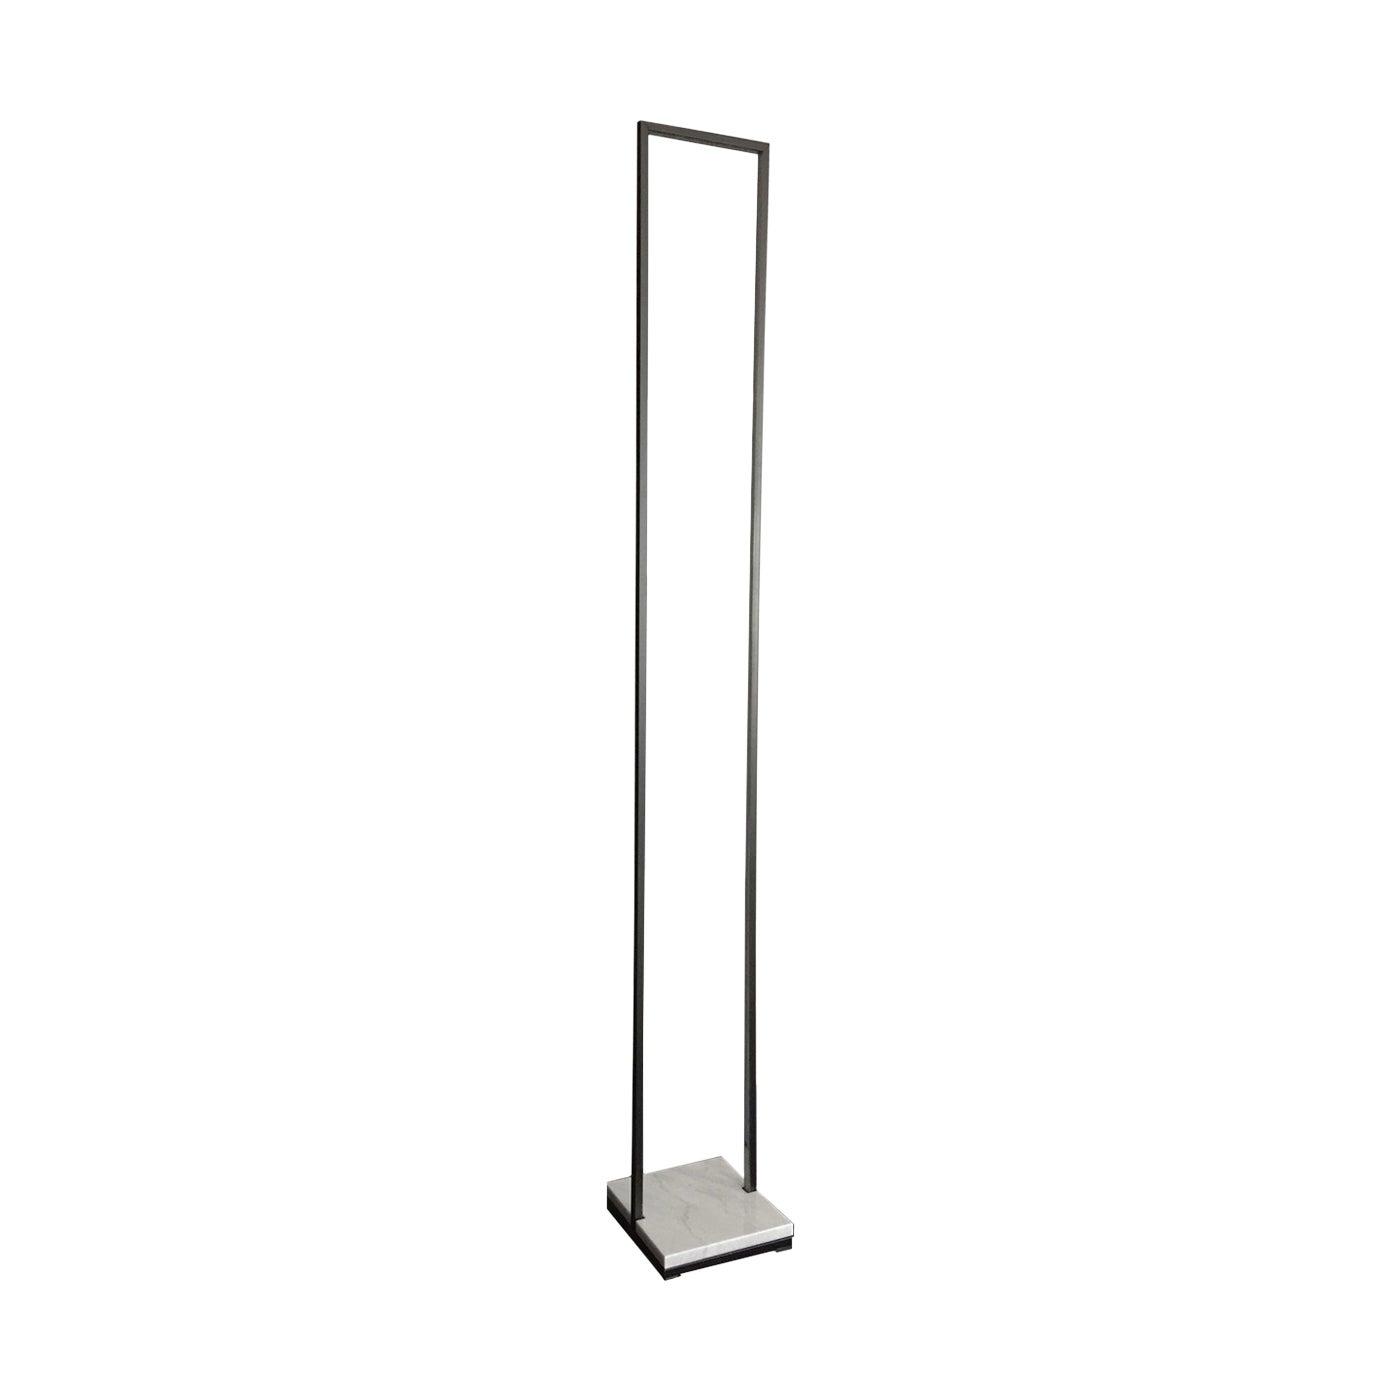 Floorframe Floor Lamp in Carrara Marble and Iron